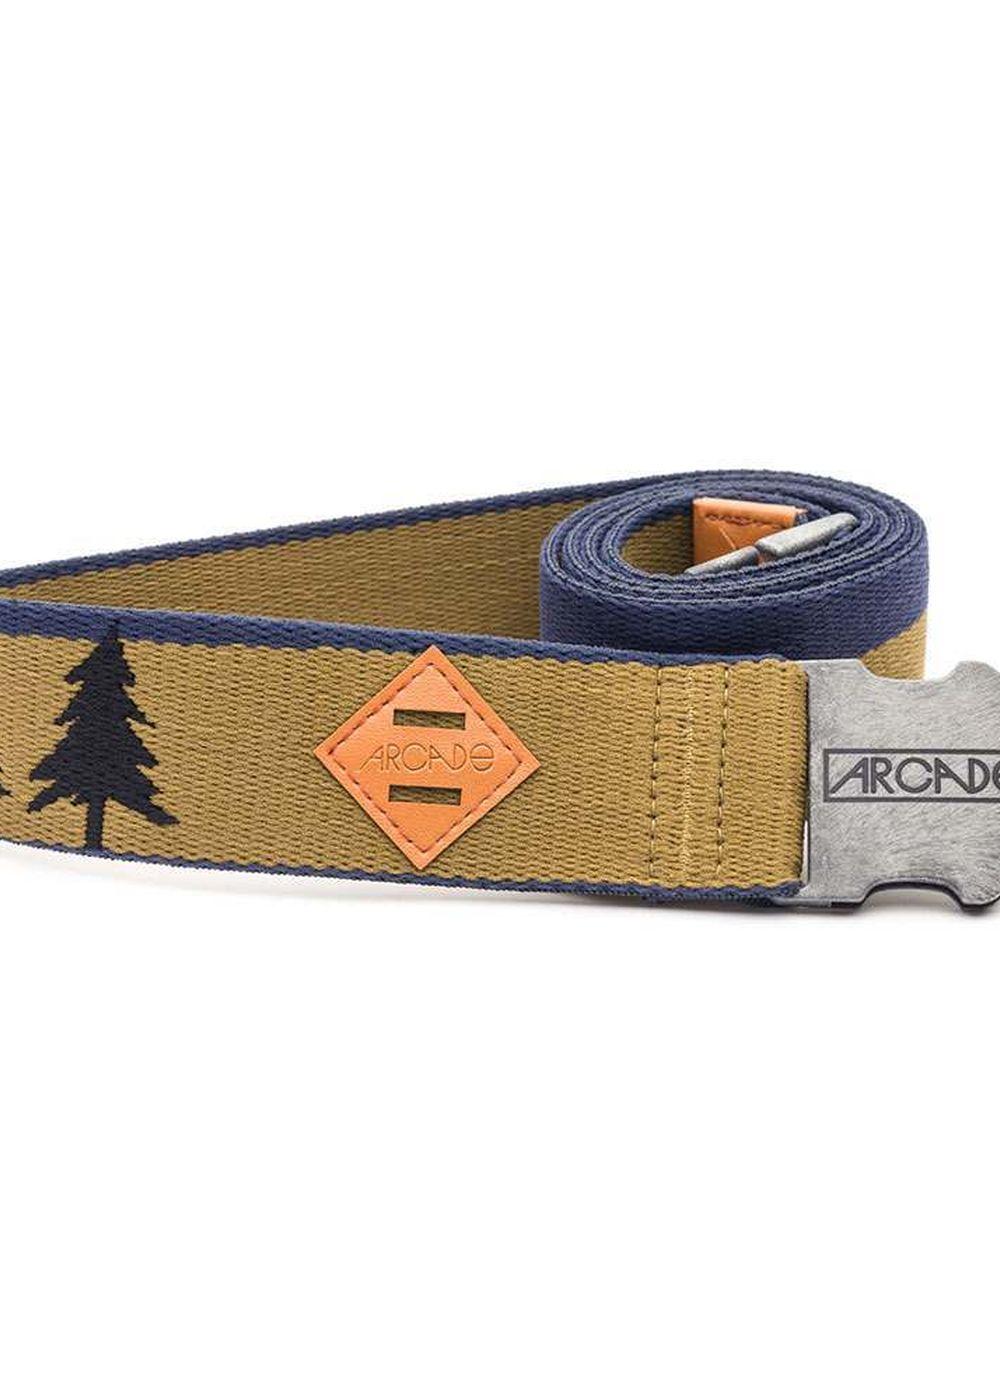 arcade belts the blackwood green/navy